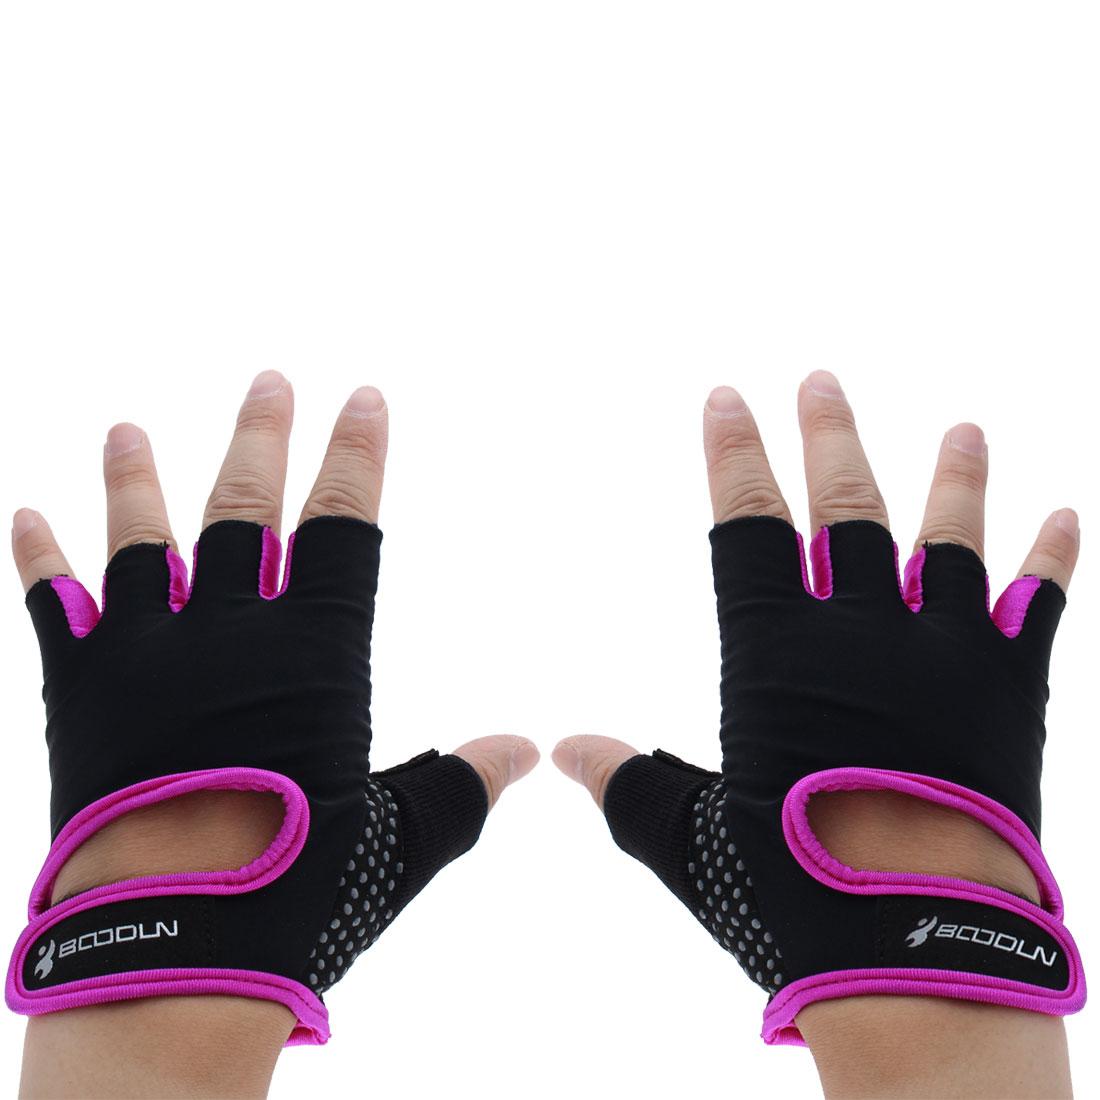 BOODUN Authorized Exercise Weight Biking Lifting Training Microfiber Non-slip Fitness Half Finger Gloves Purple L